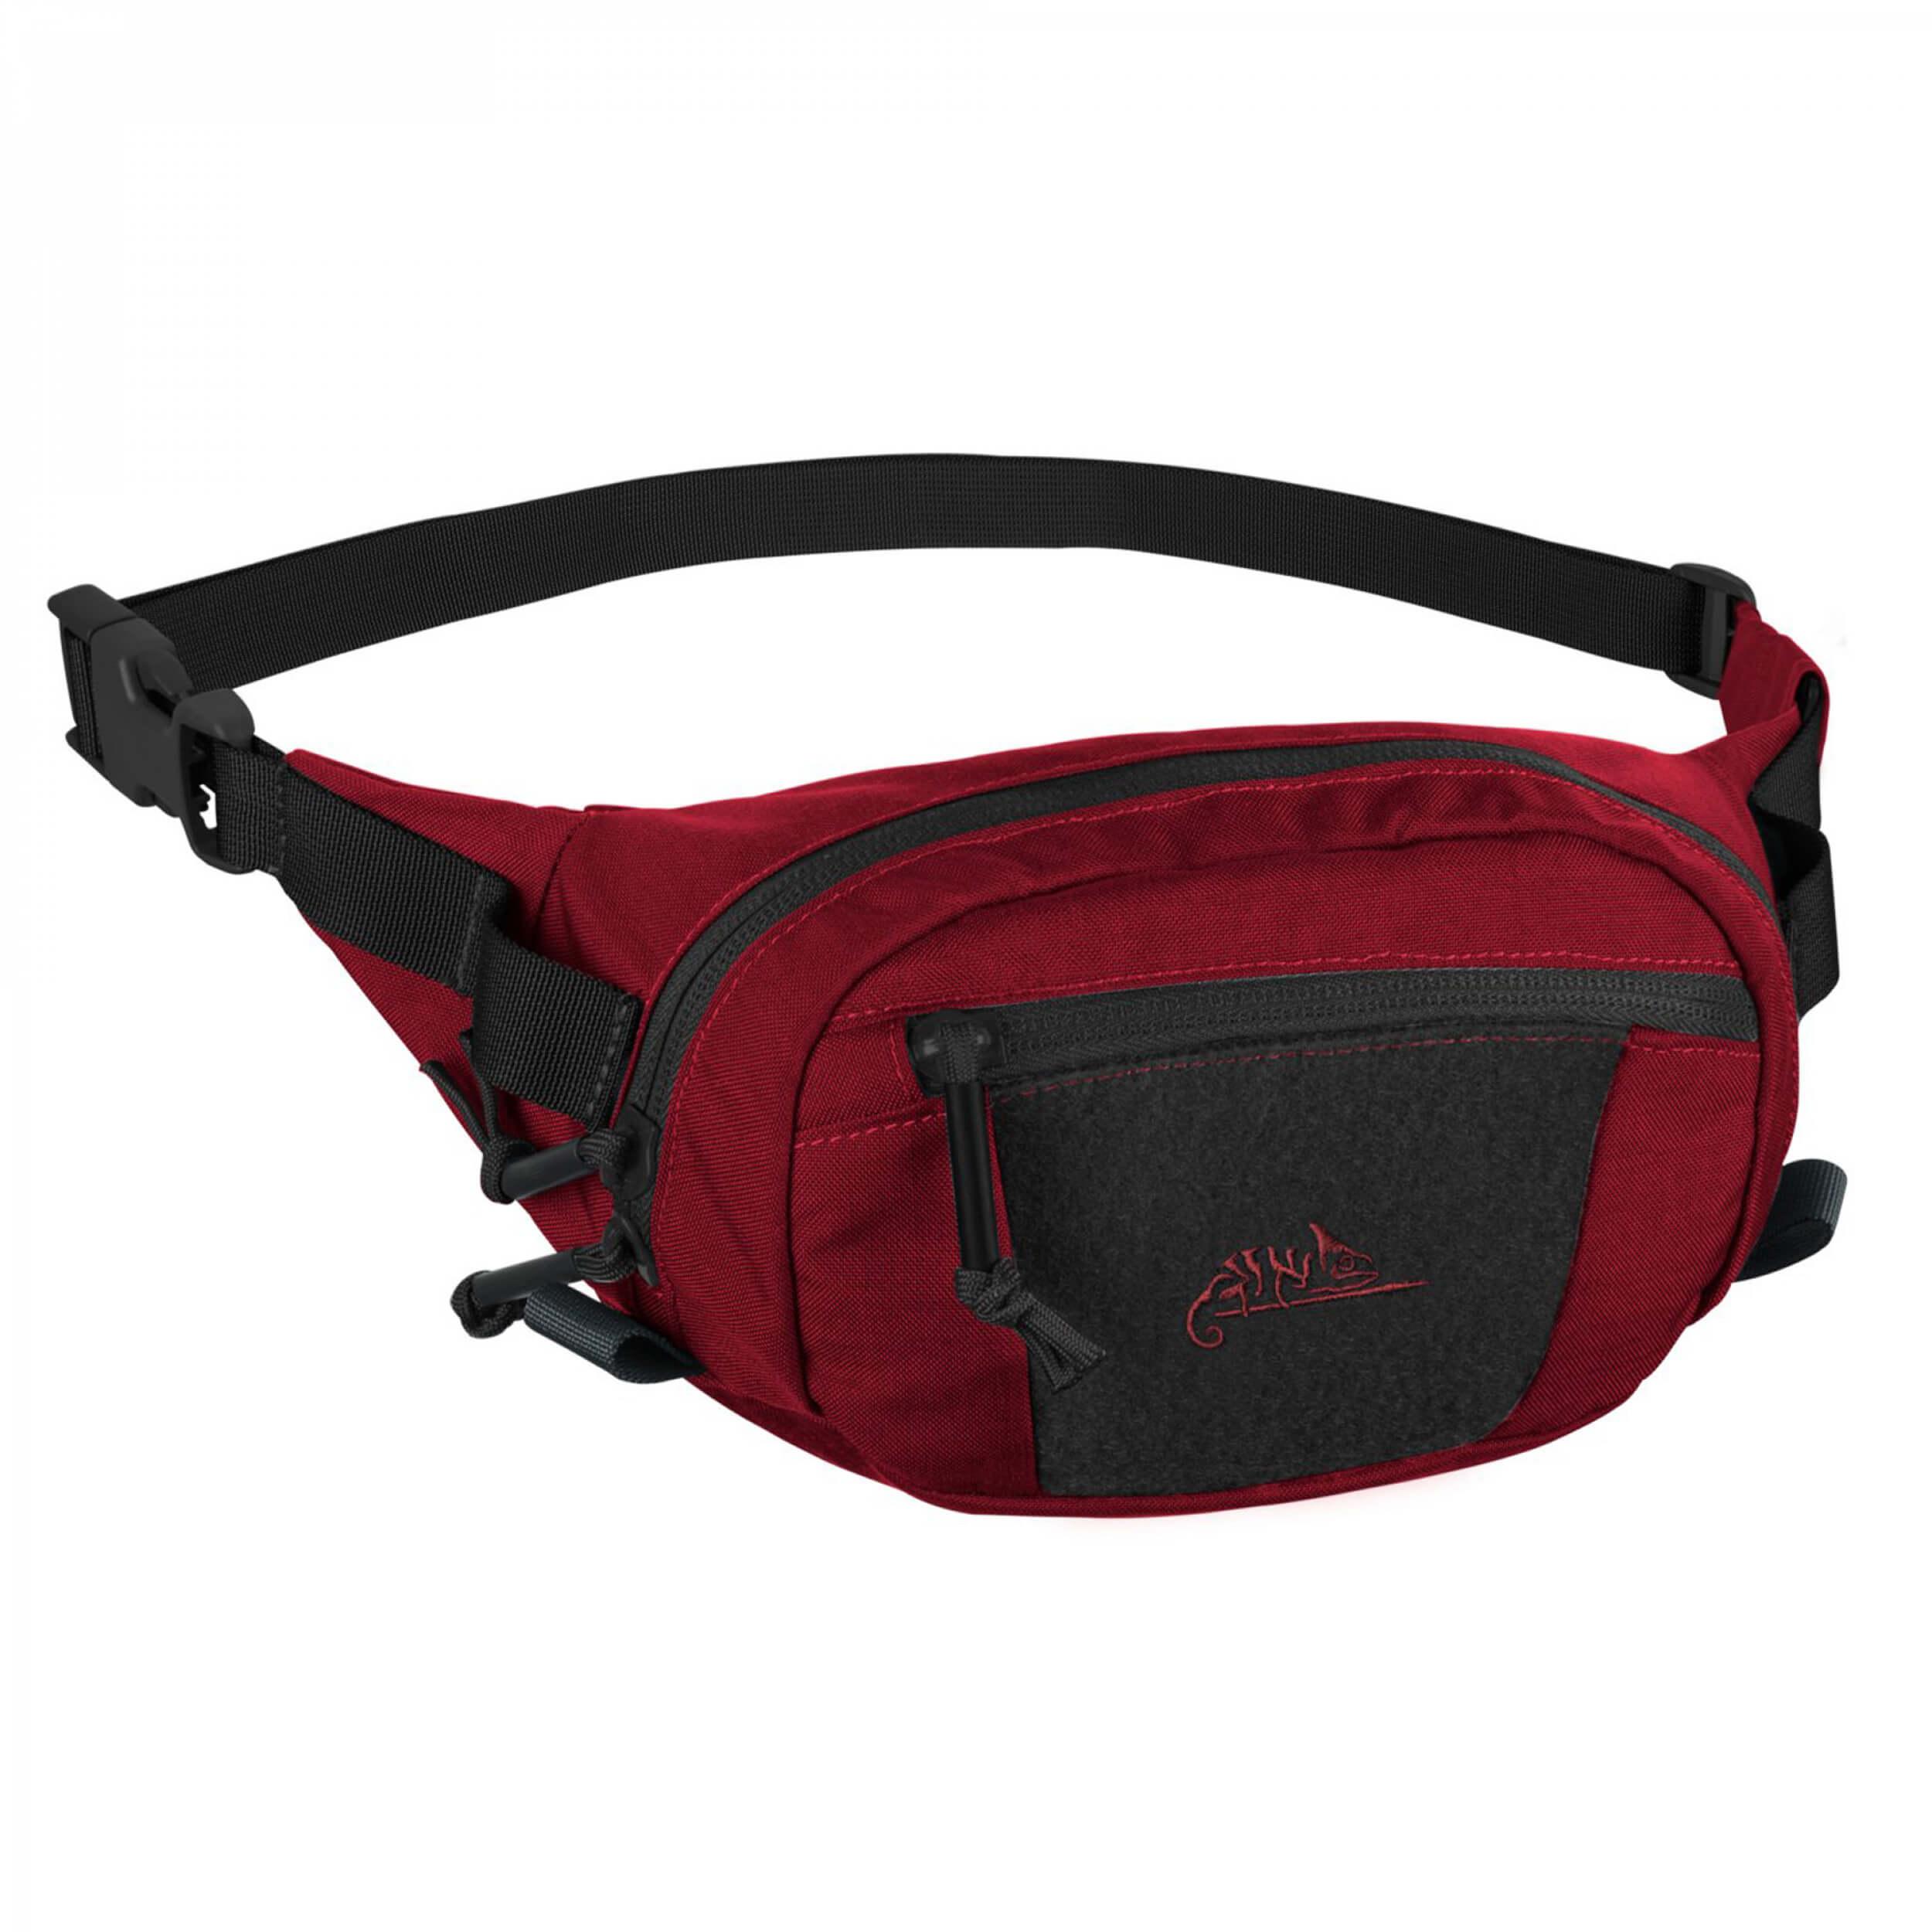 Helikon-Tex Possum Waist Pack - Cordura Red Rock / Black C